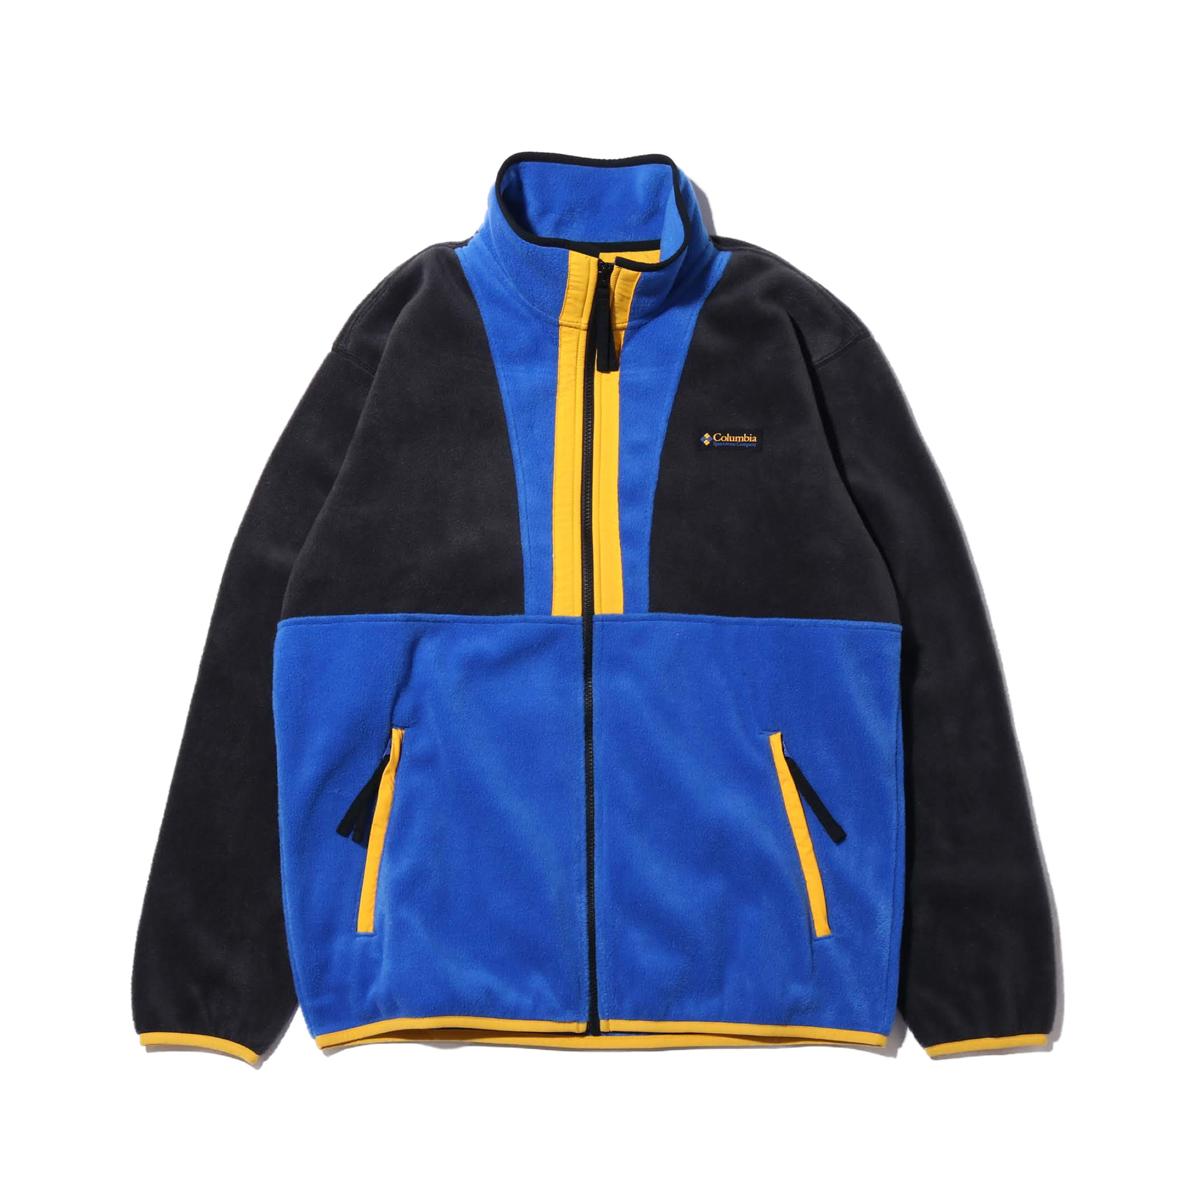 Columbia Back Bowl™ Full Zip Fleece(Azul, Black, Stinger)(コロンビア バックボール フルジップ フリース)【メンズ】【フリース】【19FA-I】